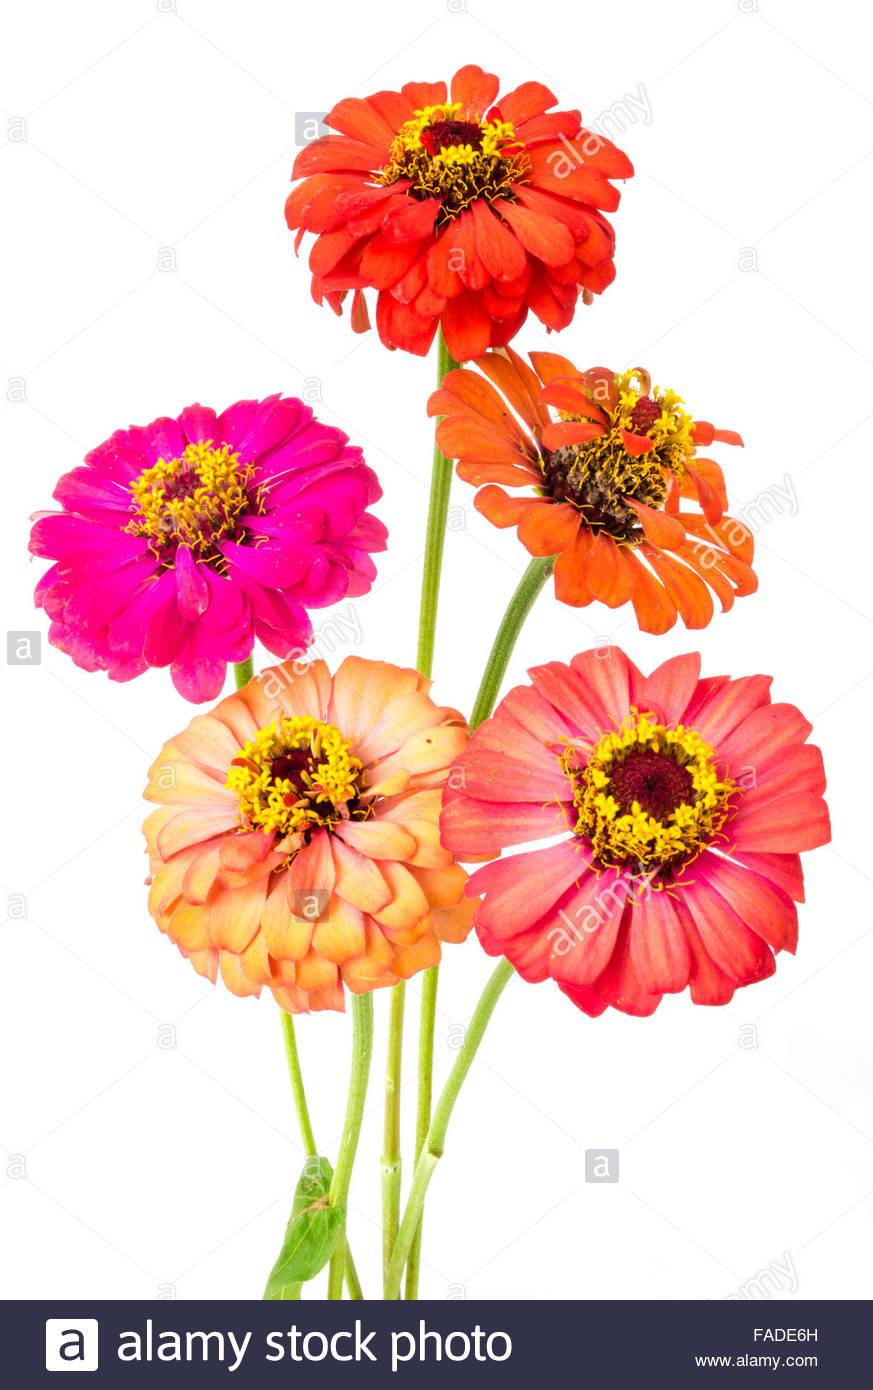 Chrysanthemum And Zinnia Stock Photos Chrysanthemum And Zinnia 873x1390